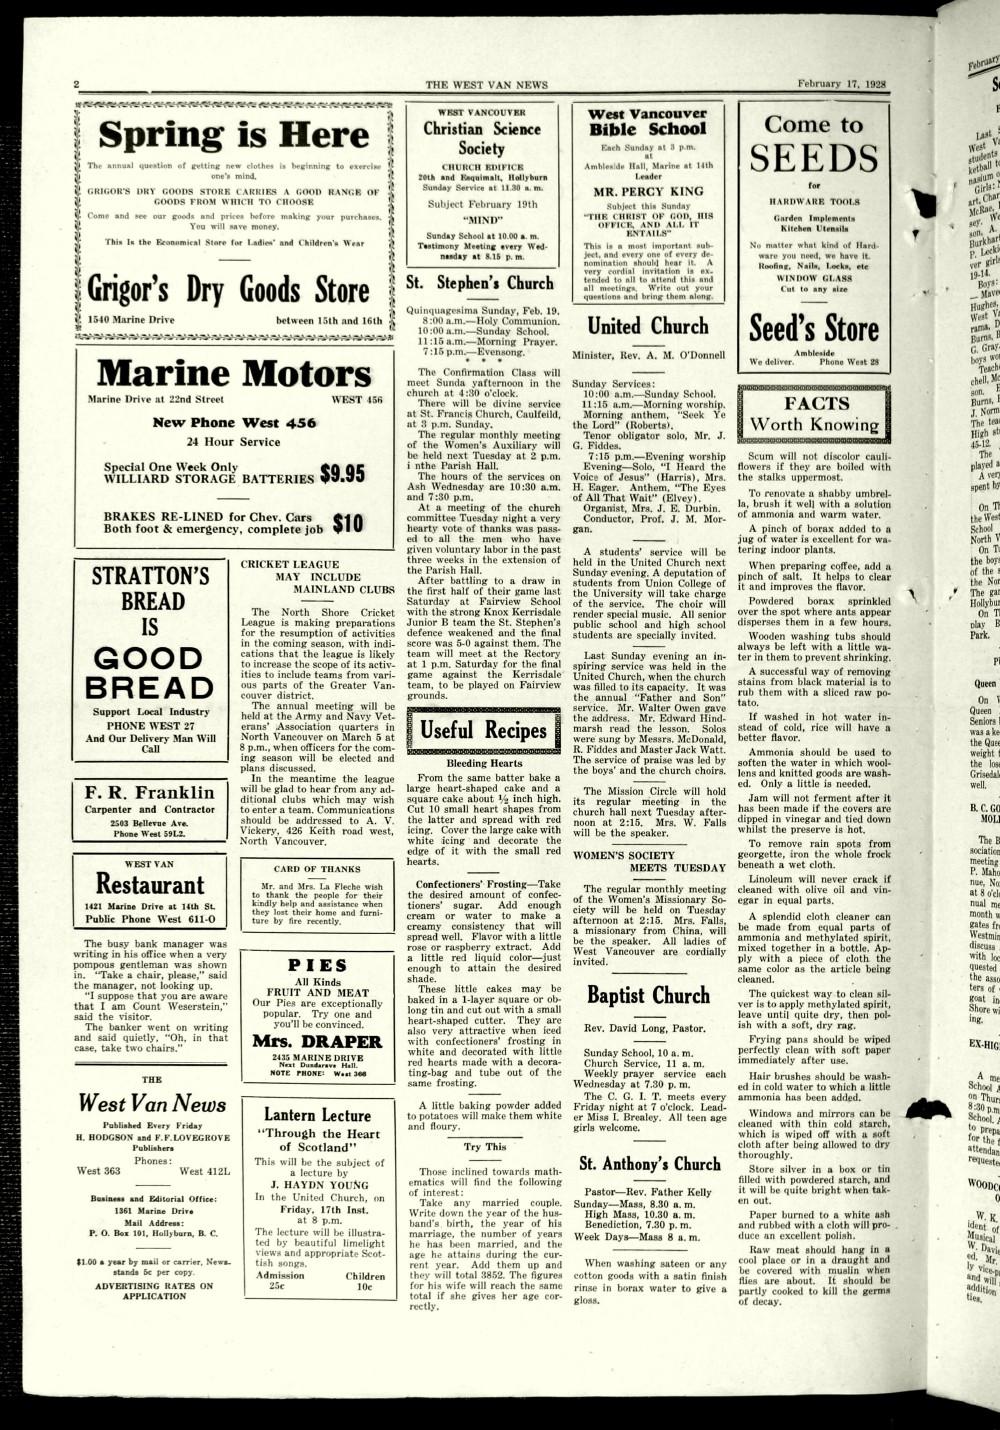 West Van. News (West Vancouver), 17 Feb 1928